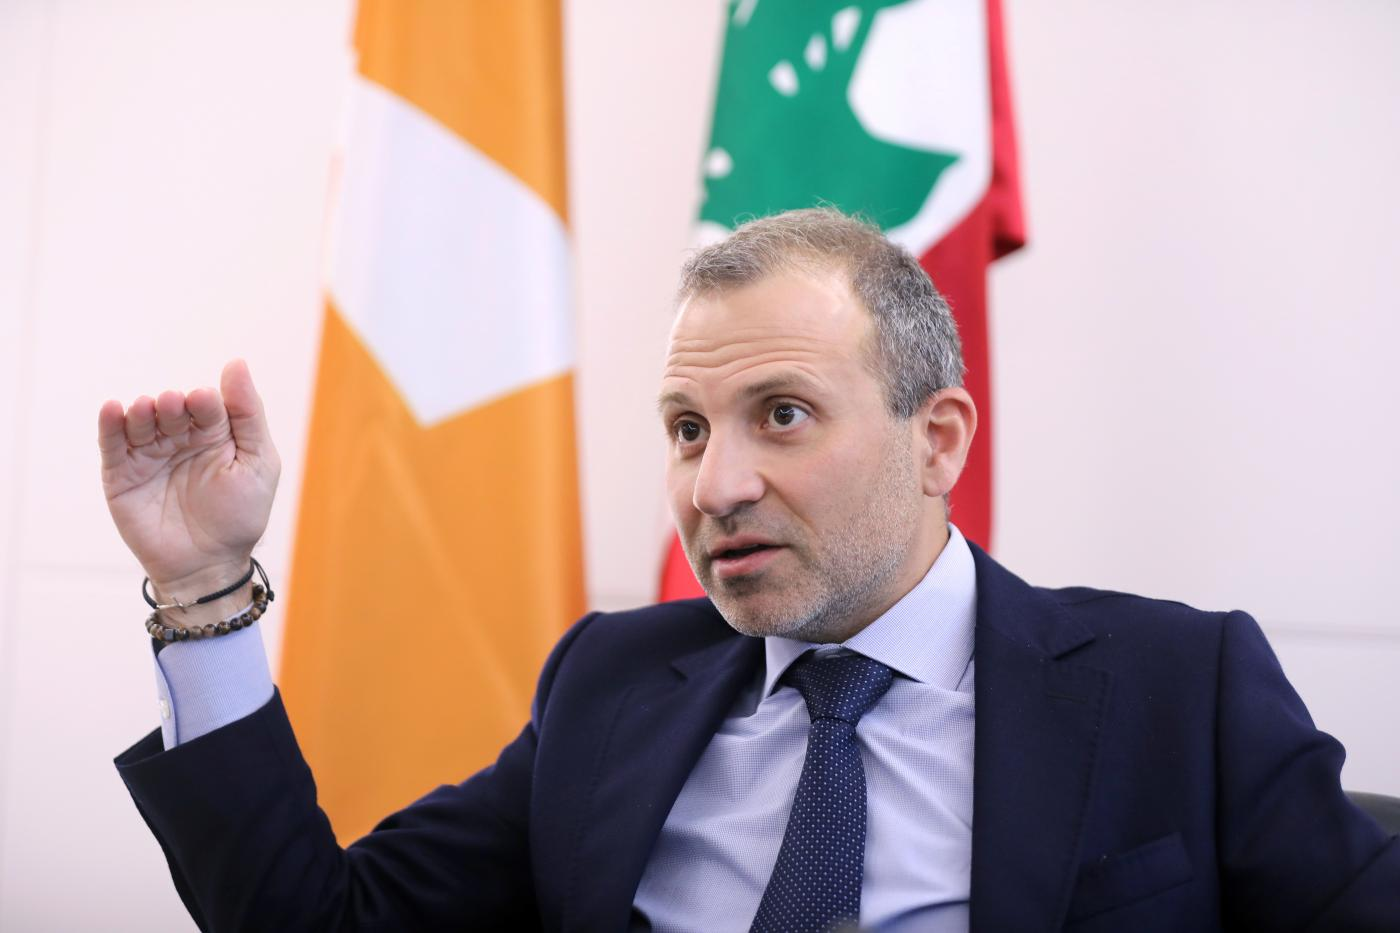 U.S. to sanction leader of Lebanon's Free Patriotic Movement